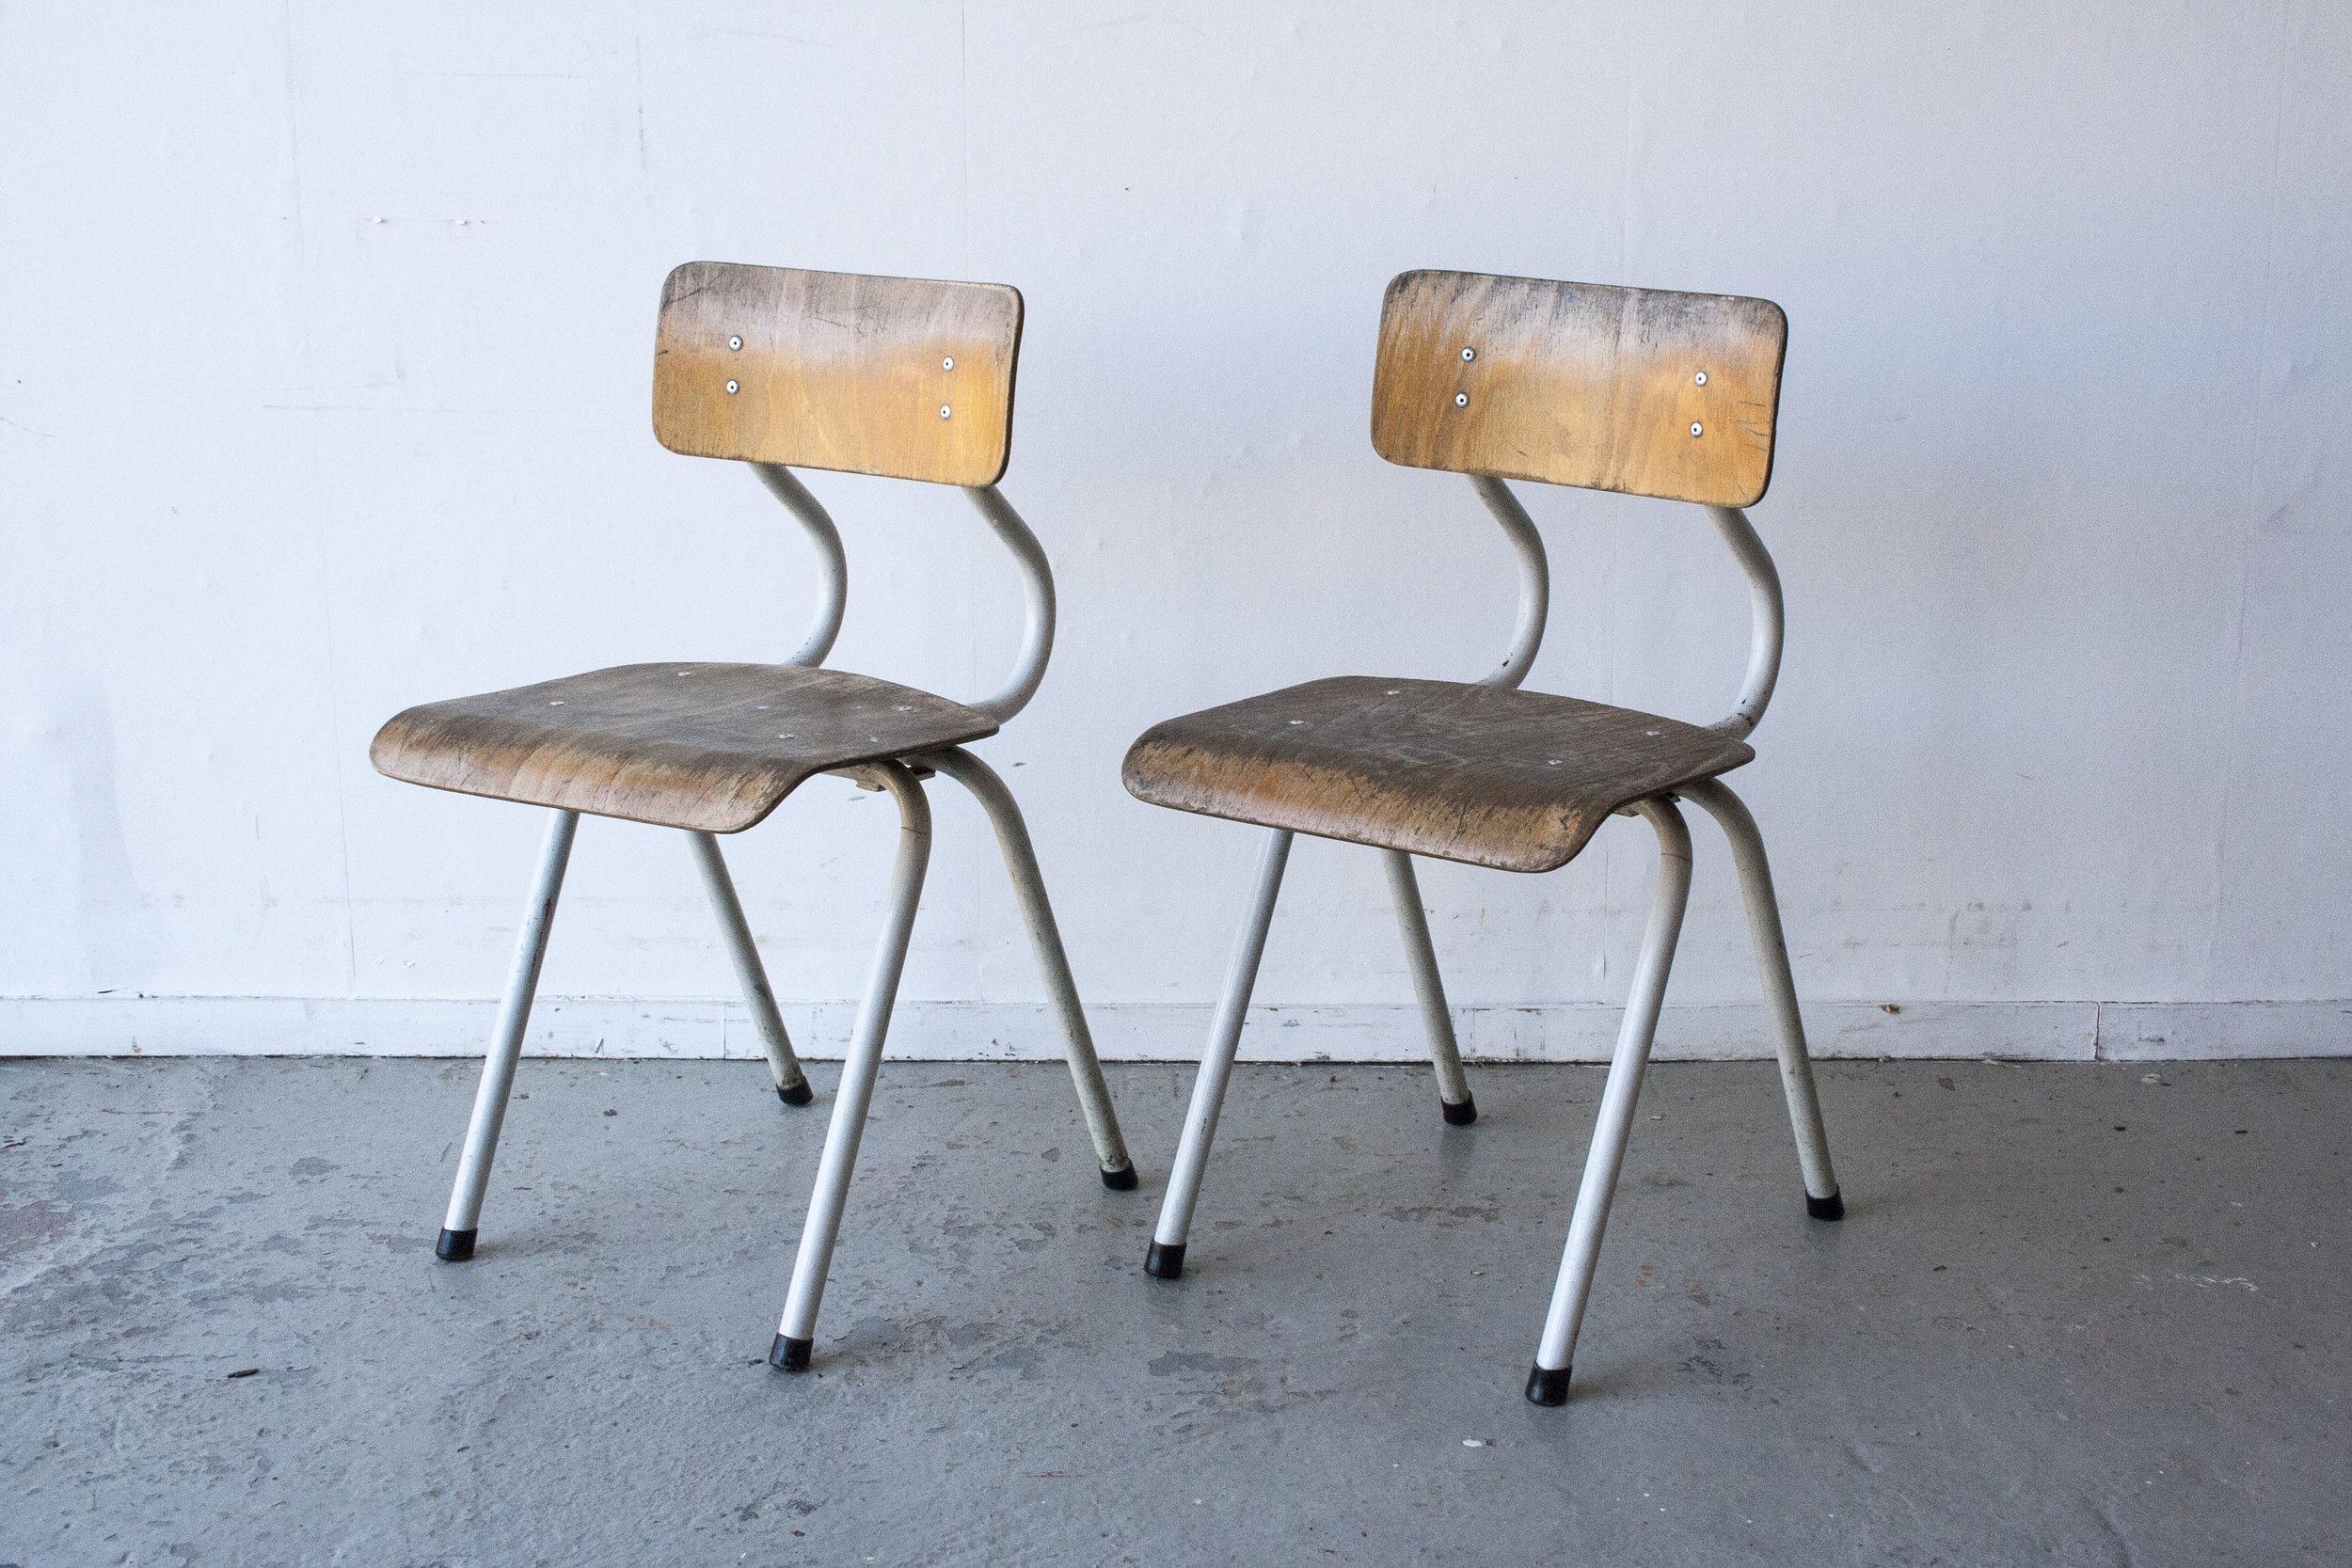 2 x Witte houten stoeltes - Firma zoethout.jpg